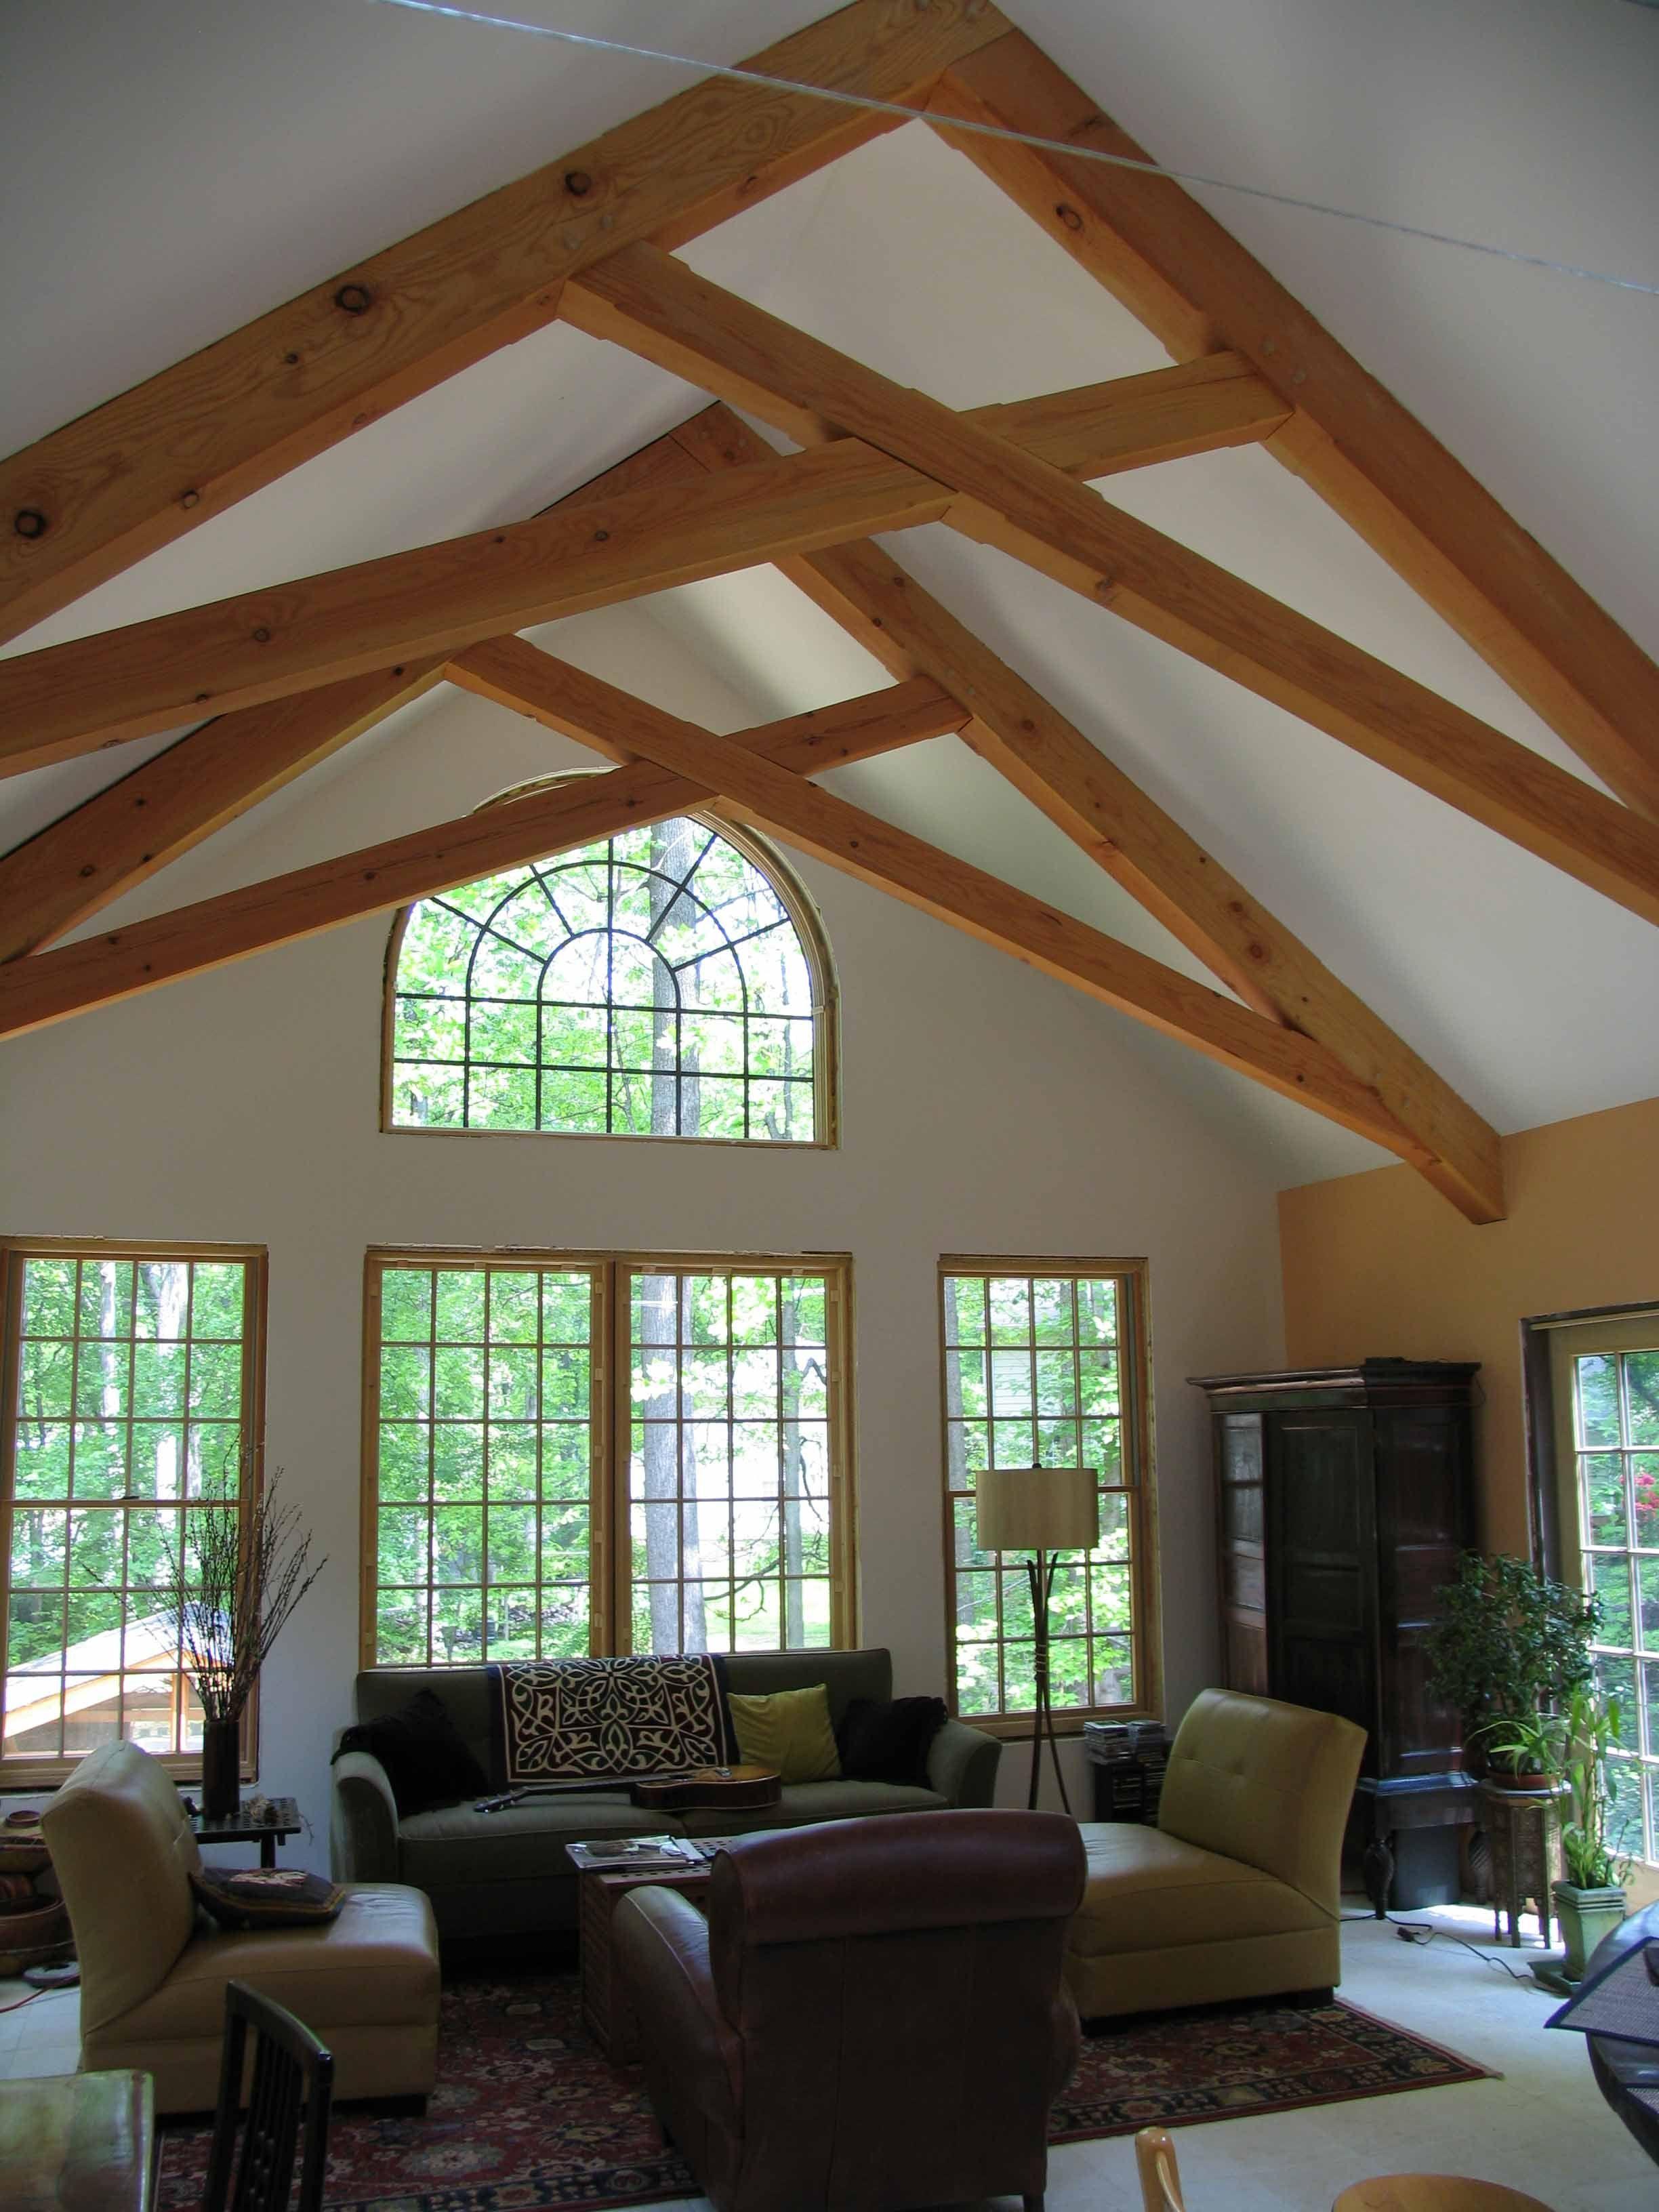 Private Residence Scissor Trusses Roof Truss Design Timber